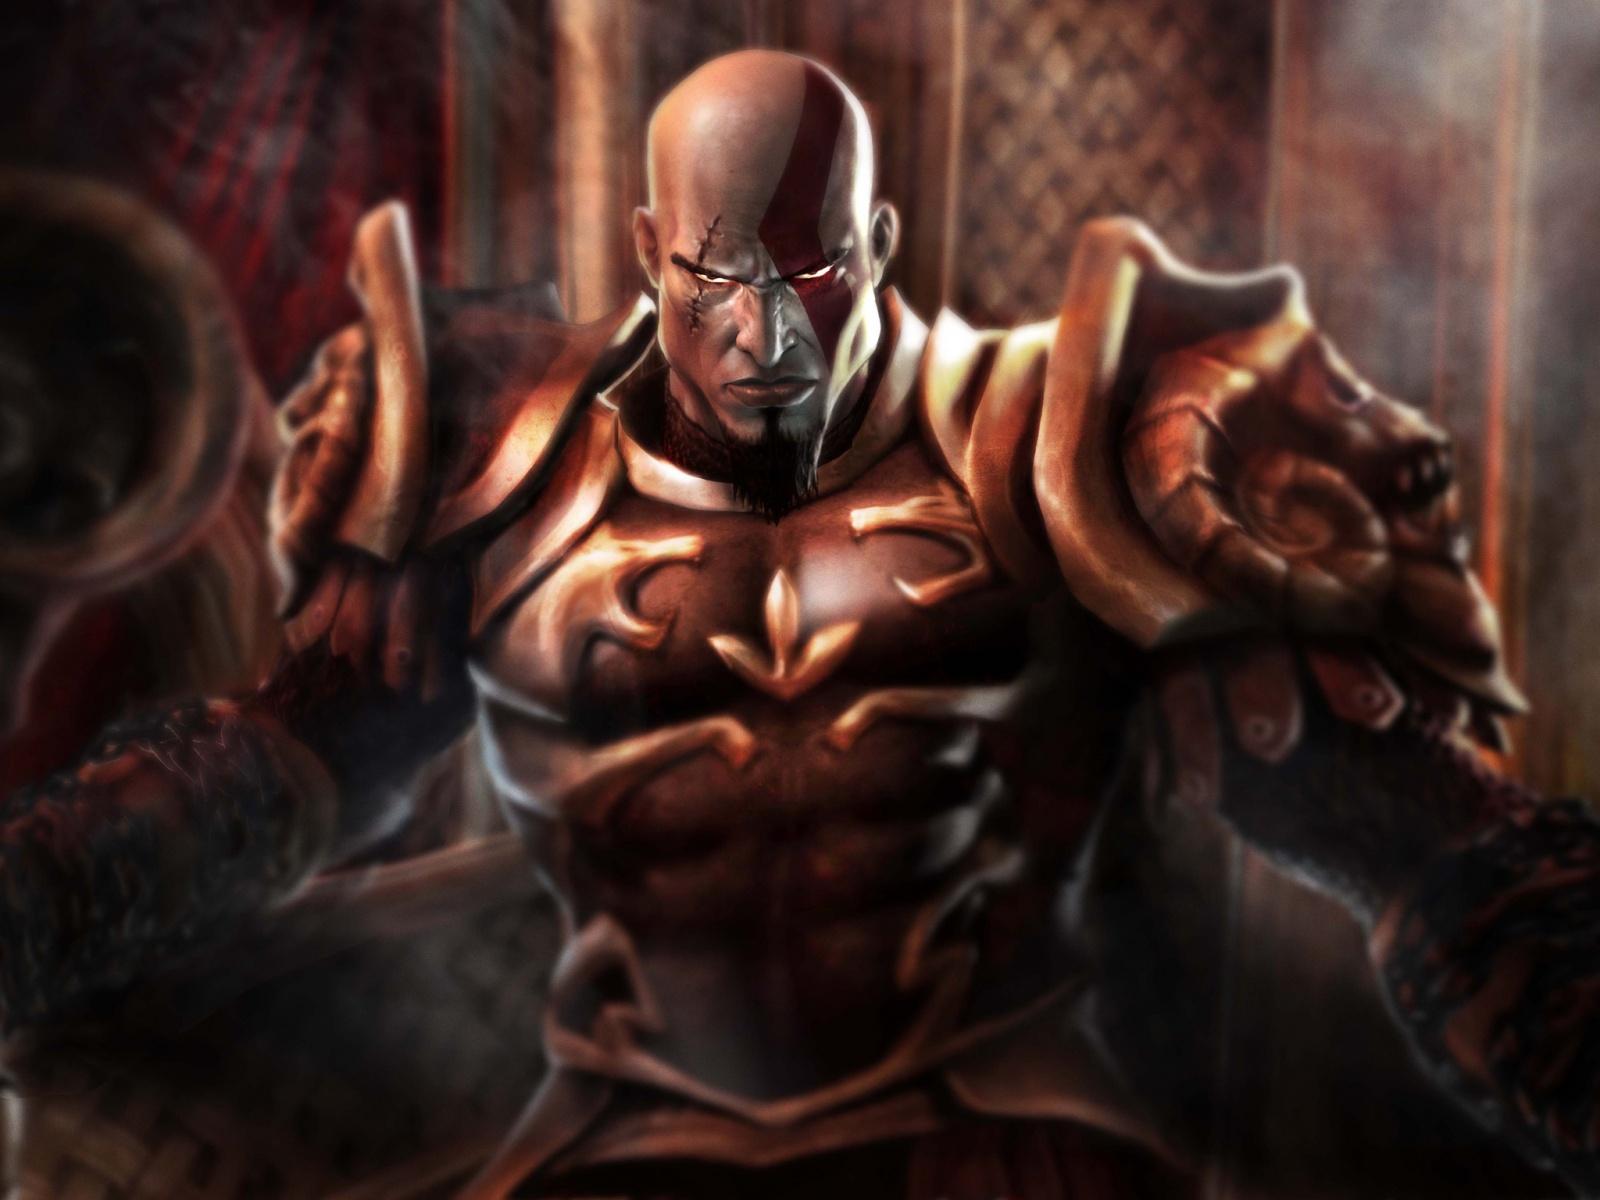 Kratos god of war wallpapers in jpg format for free download kratos god of war wallpapers voltagebd Images